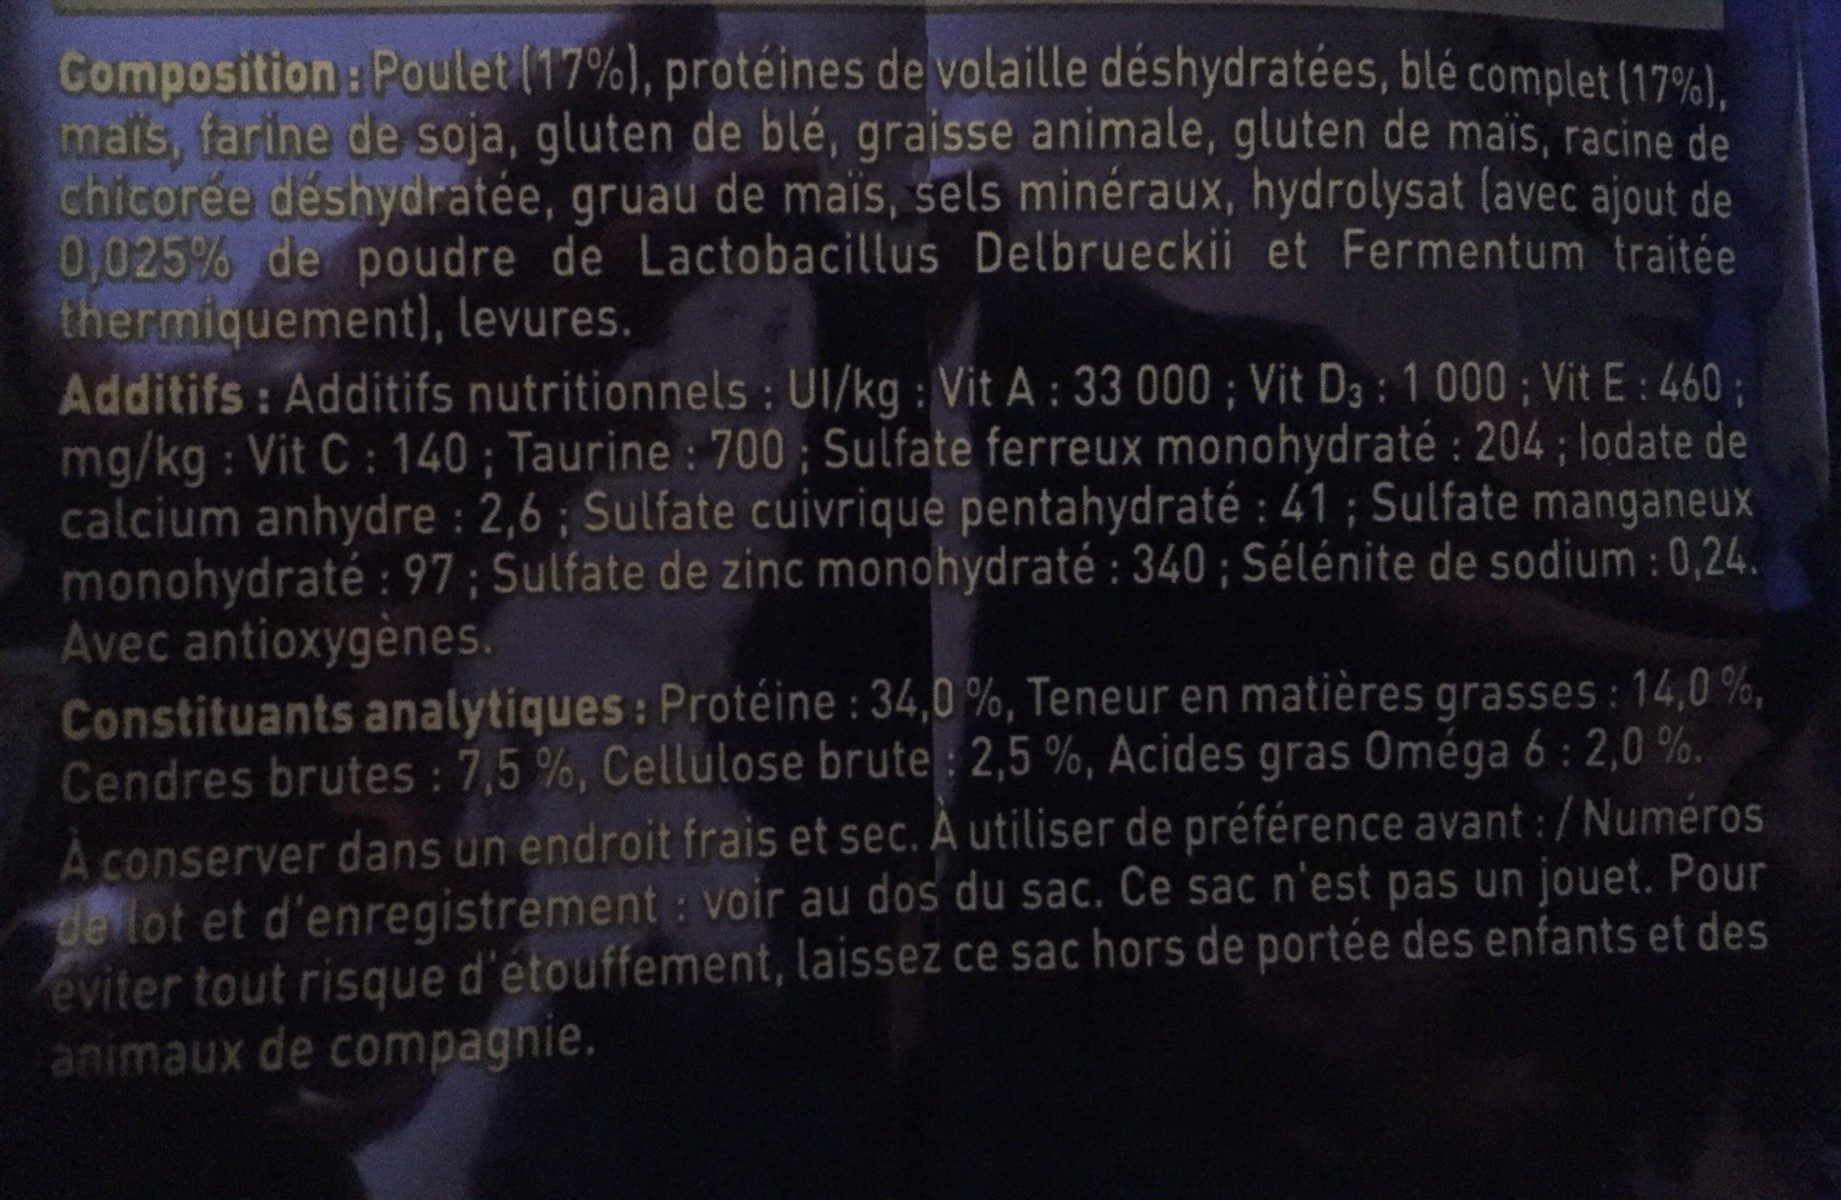 Purina One Adulte 3kg - Ingrédients